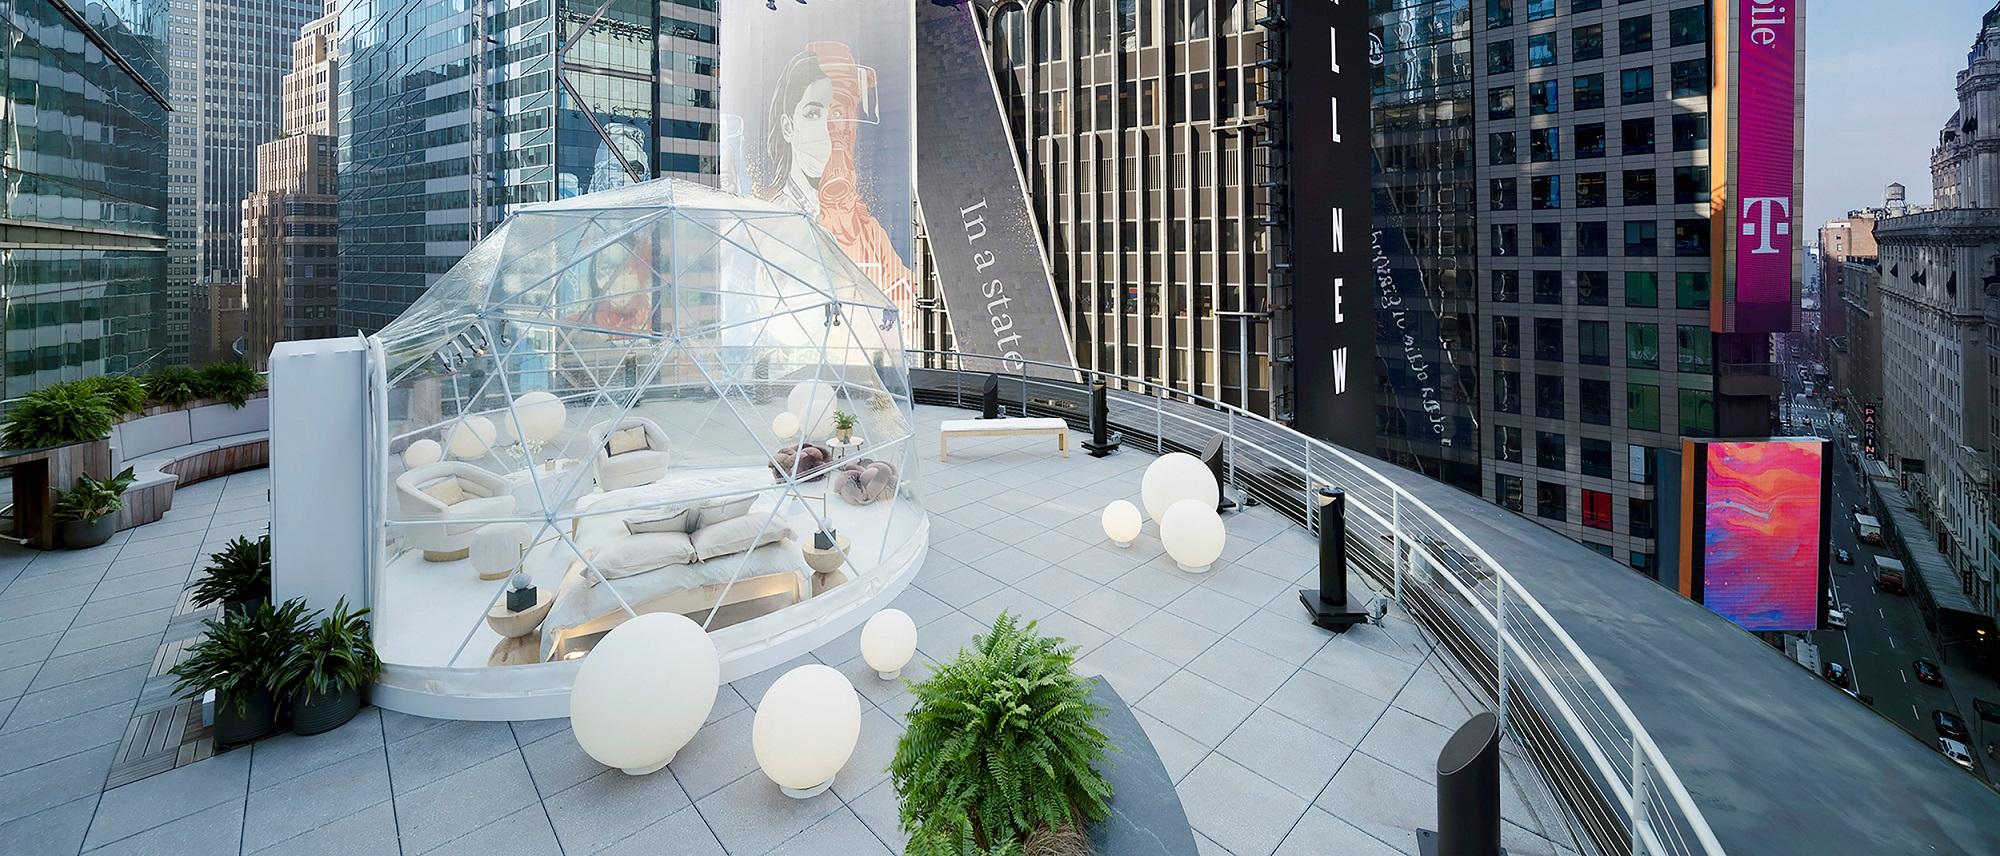 Airbnb 攜手那斯達克邀請紐約客夜宿時代廣場 與時代廣場著名水晶球共迎 2021